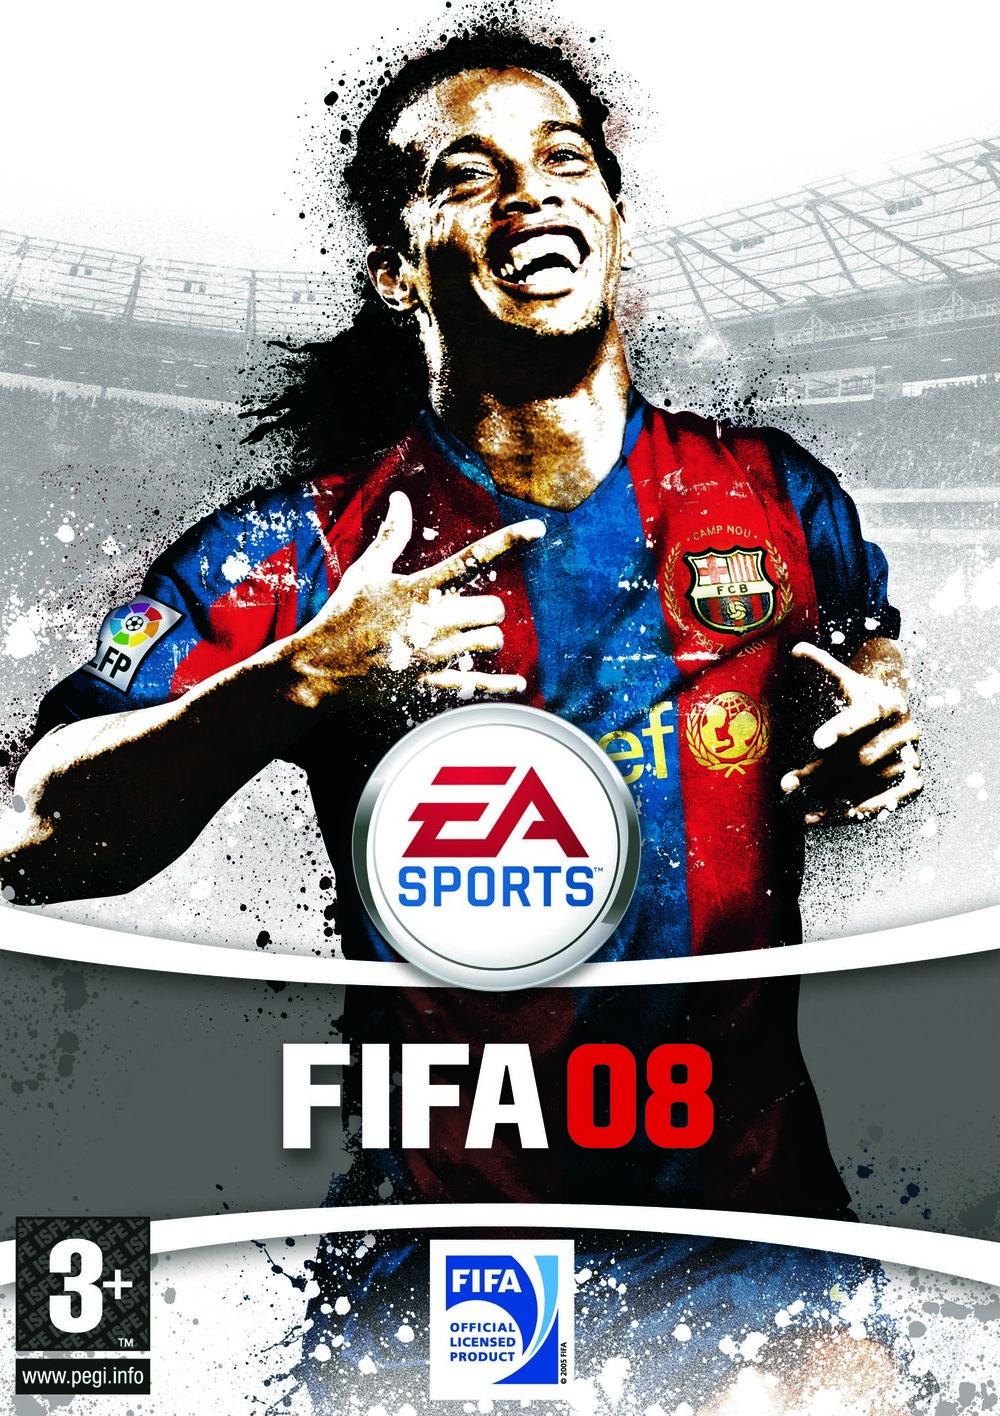 FIFA08genPFTita.jpg